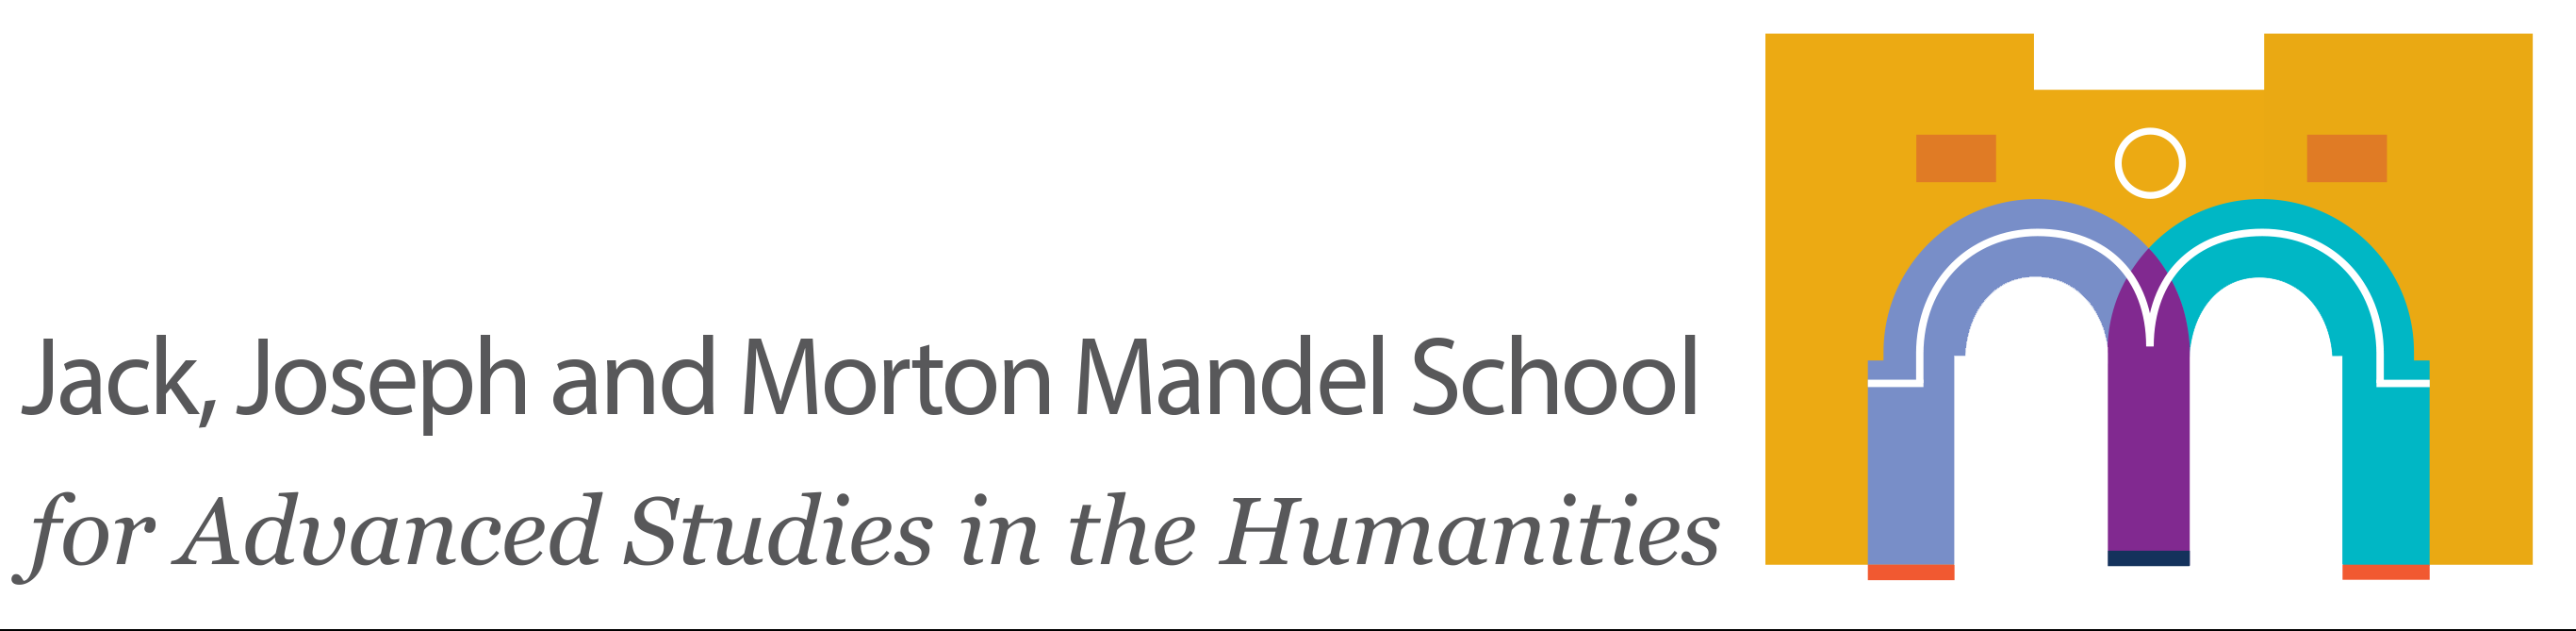 Jack, Joseph & Morton Mandel School for Advanced Studies in the Humanities